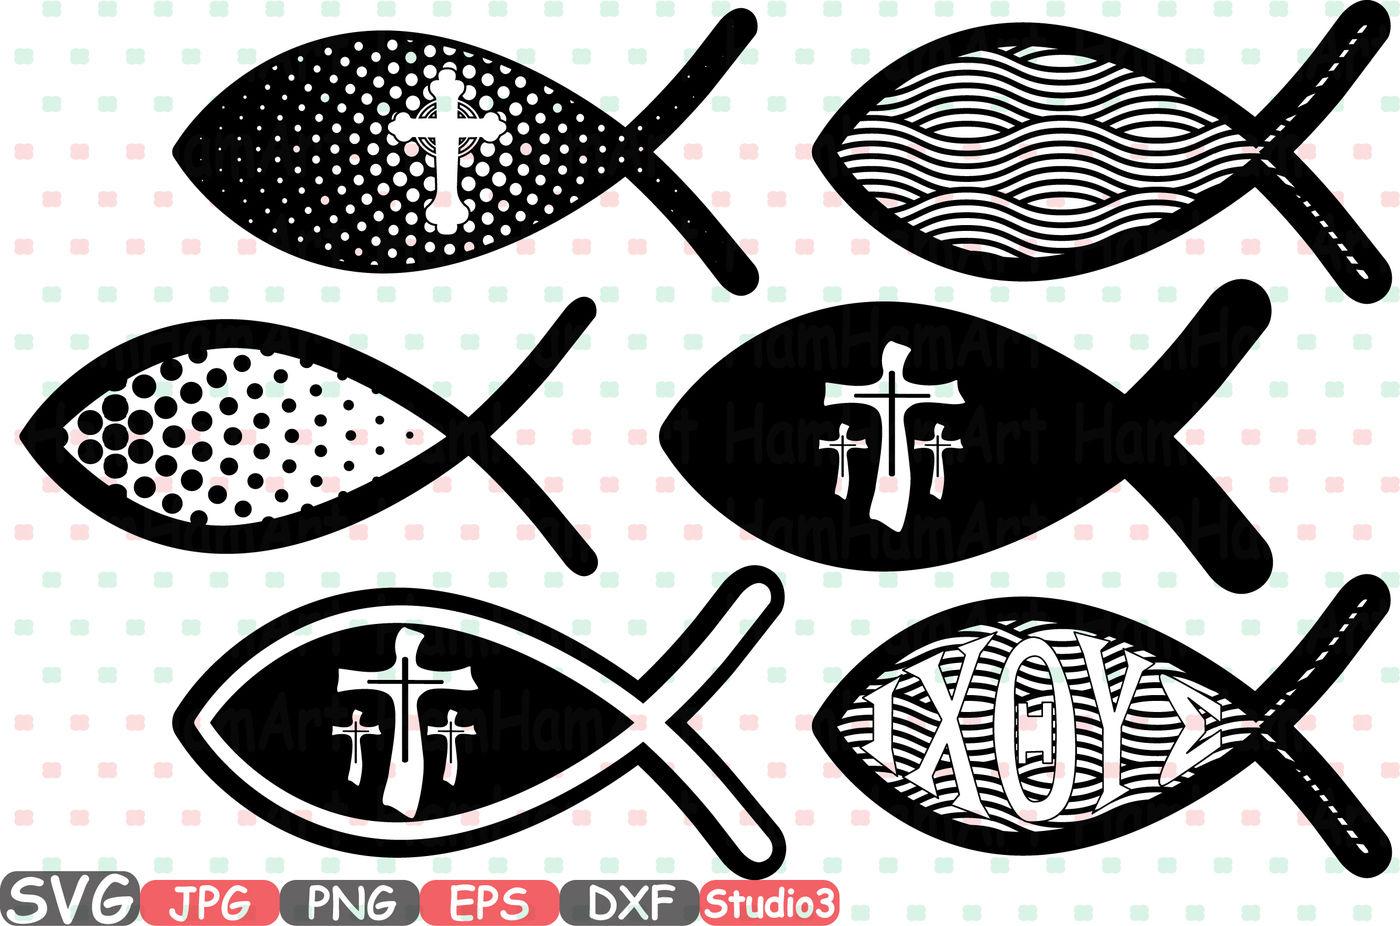 Jesus Fish Svg Silhouette Cutting Files Cricut Studio3 Cameo Jesus